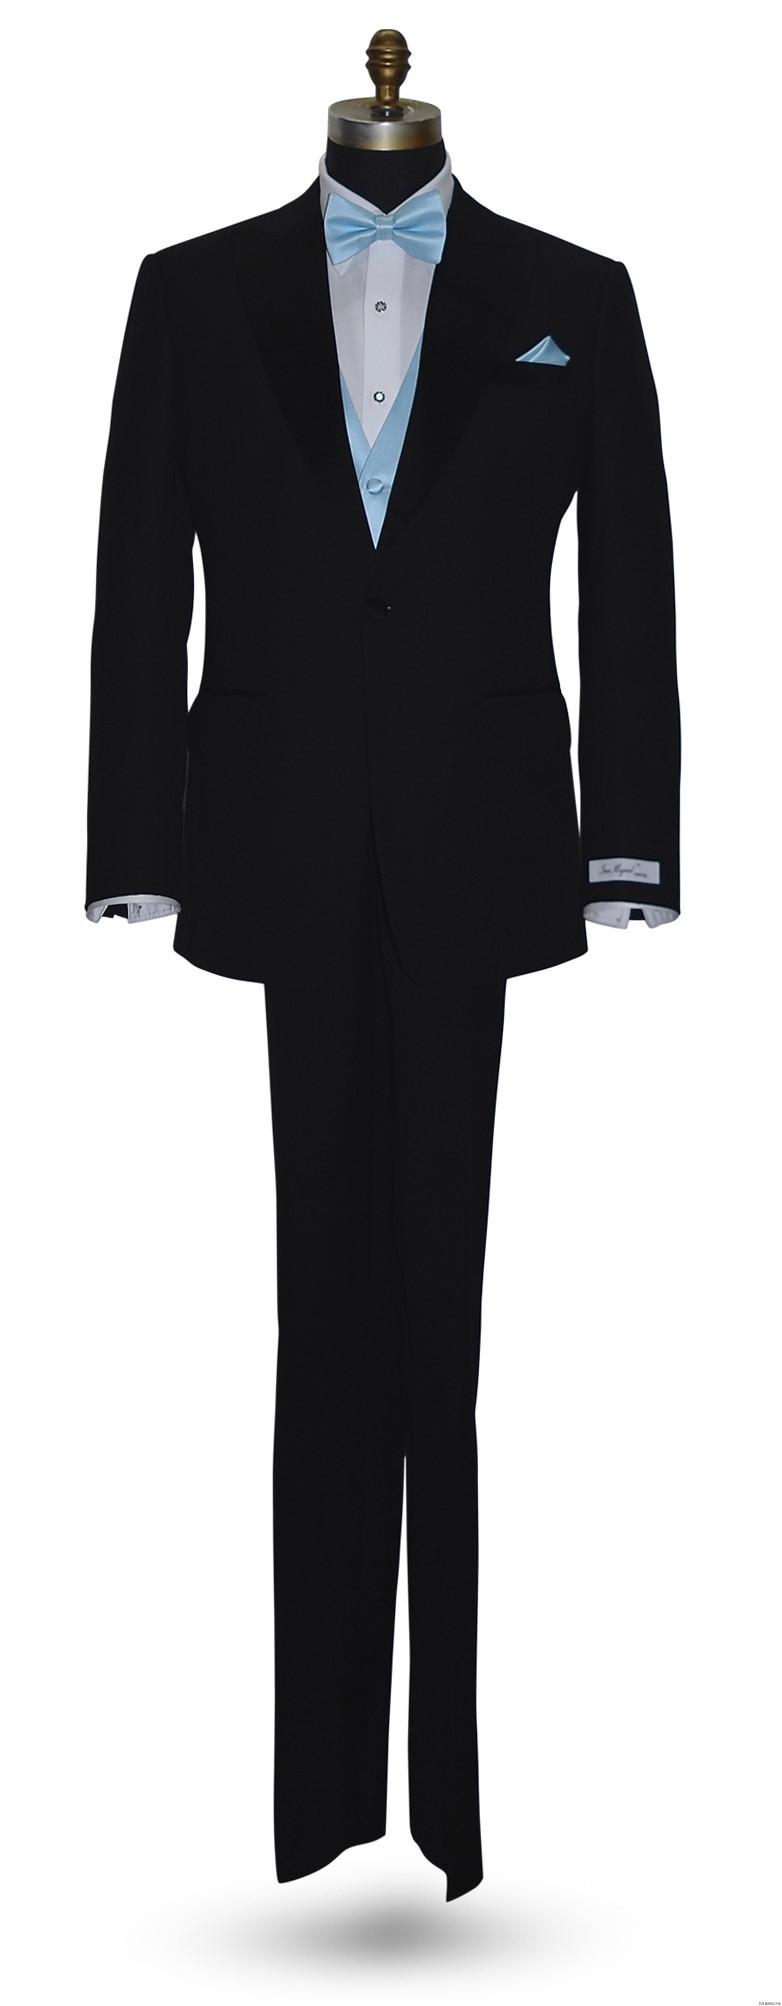 San Miguel black tuxedo with capri-blue pre-tied bowtie and capri blue vest and pocket handkerchief